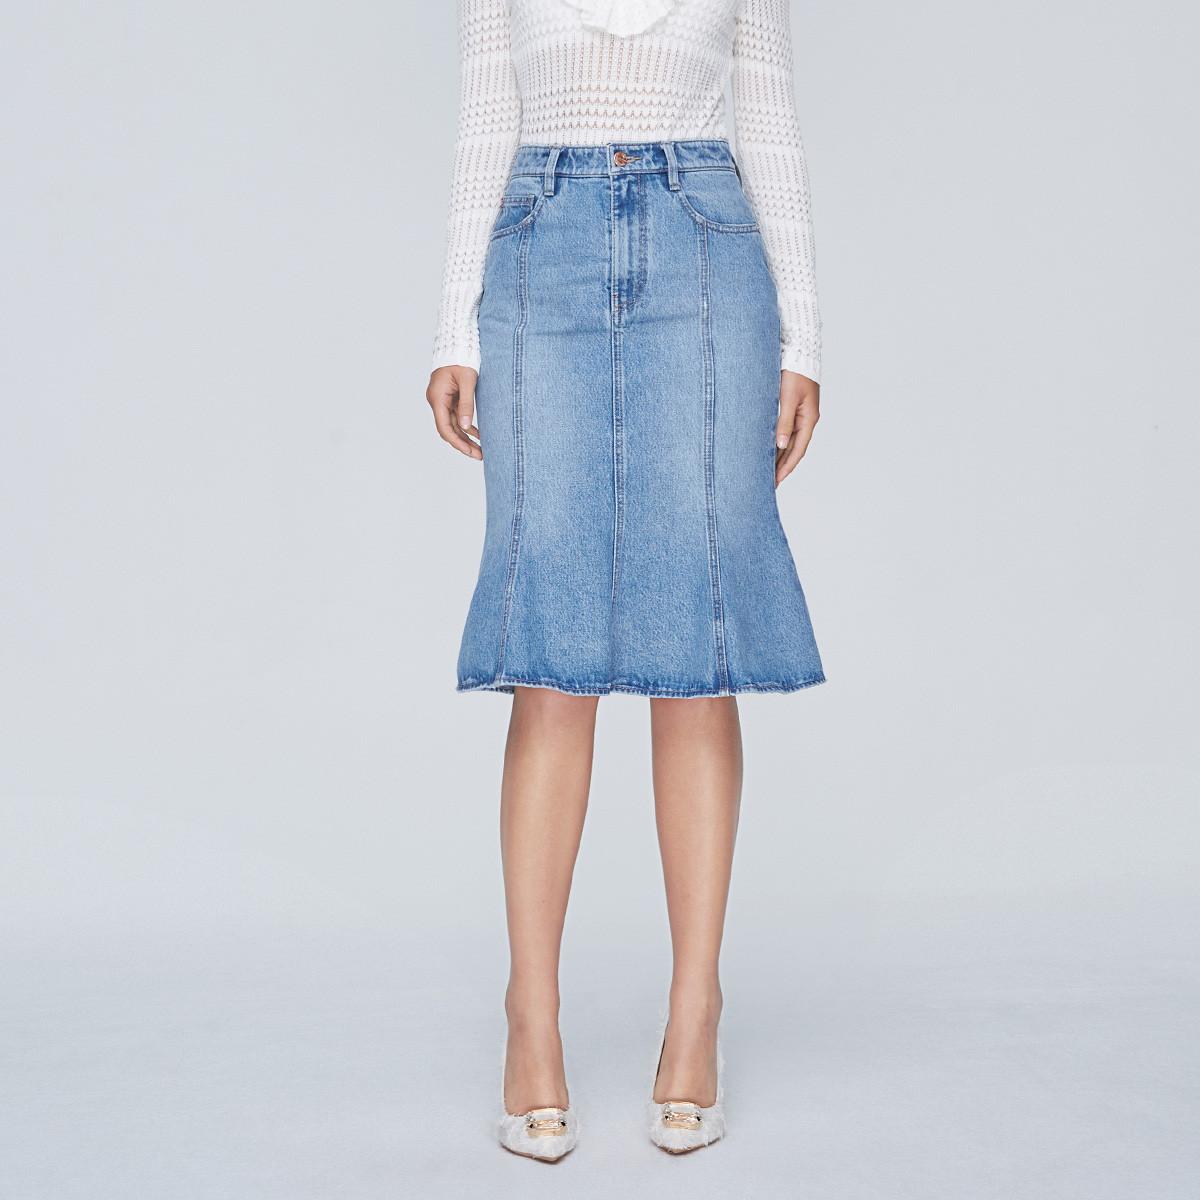 MISS SIXTY 荷叶边鱼尾裙一步裙包臀裙牛仔裙女士半身裙